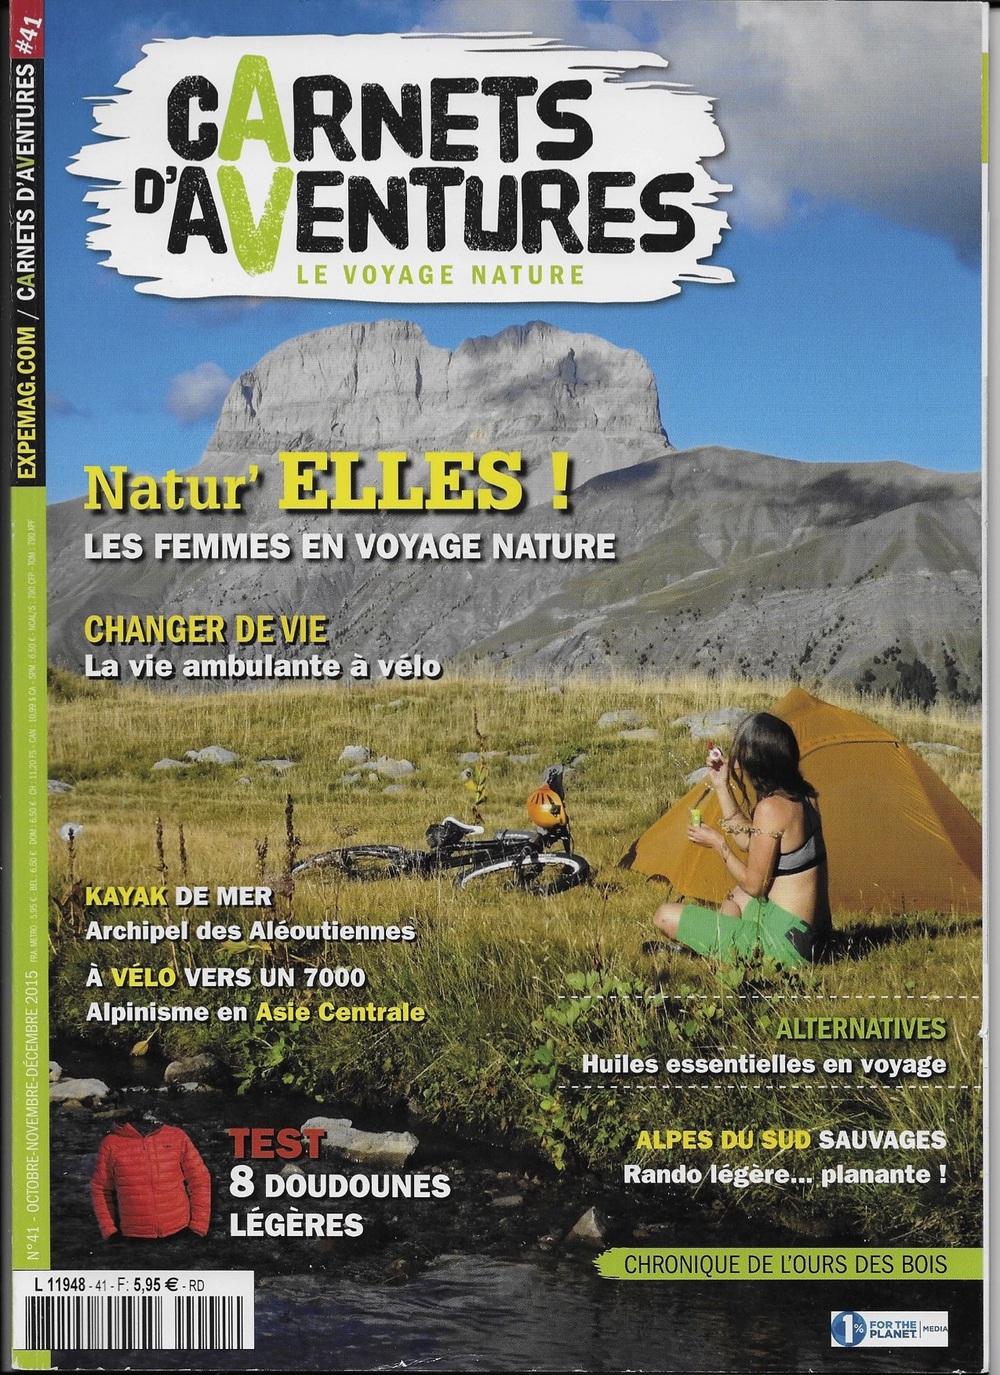 Carnets d'aventure - Octobre 2015 (Lien)